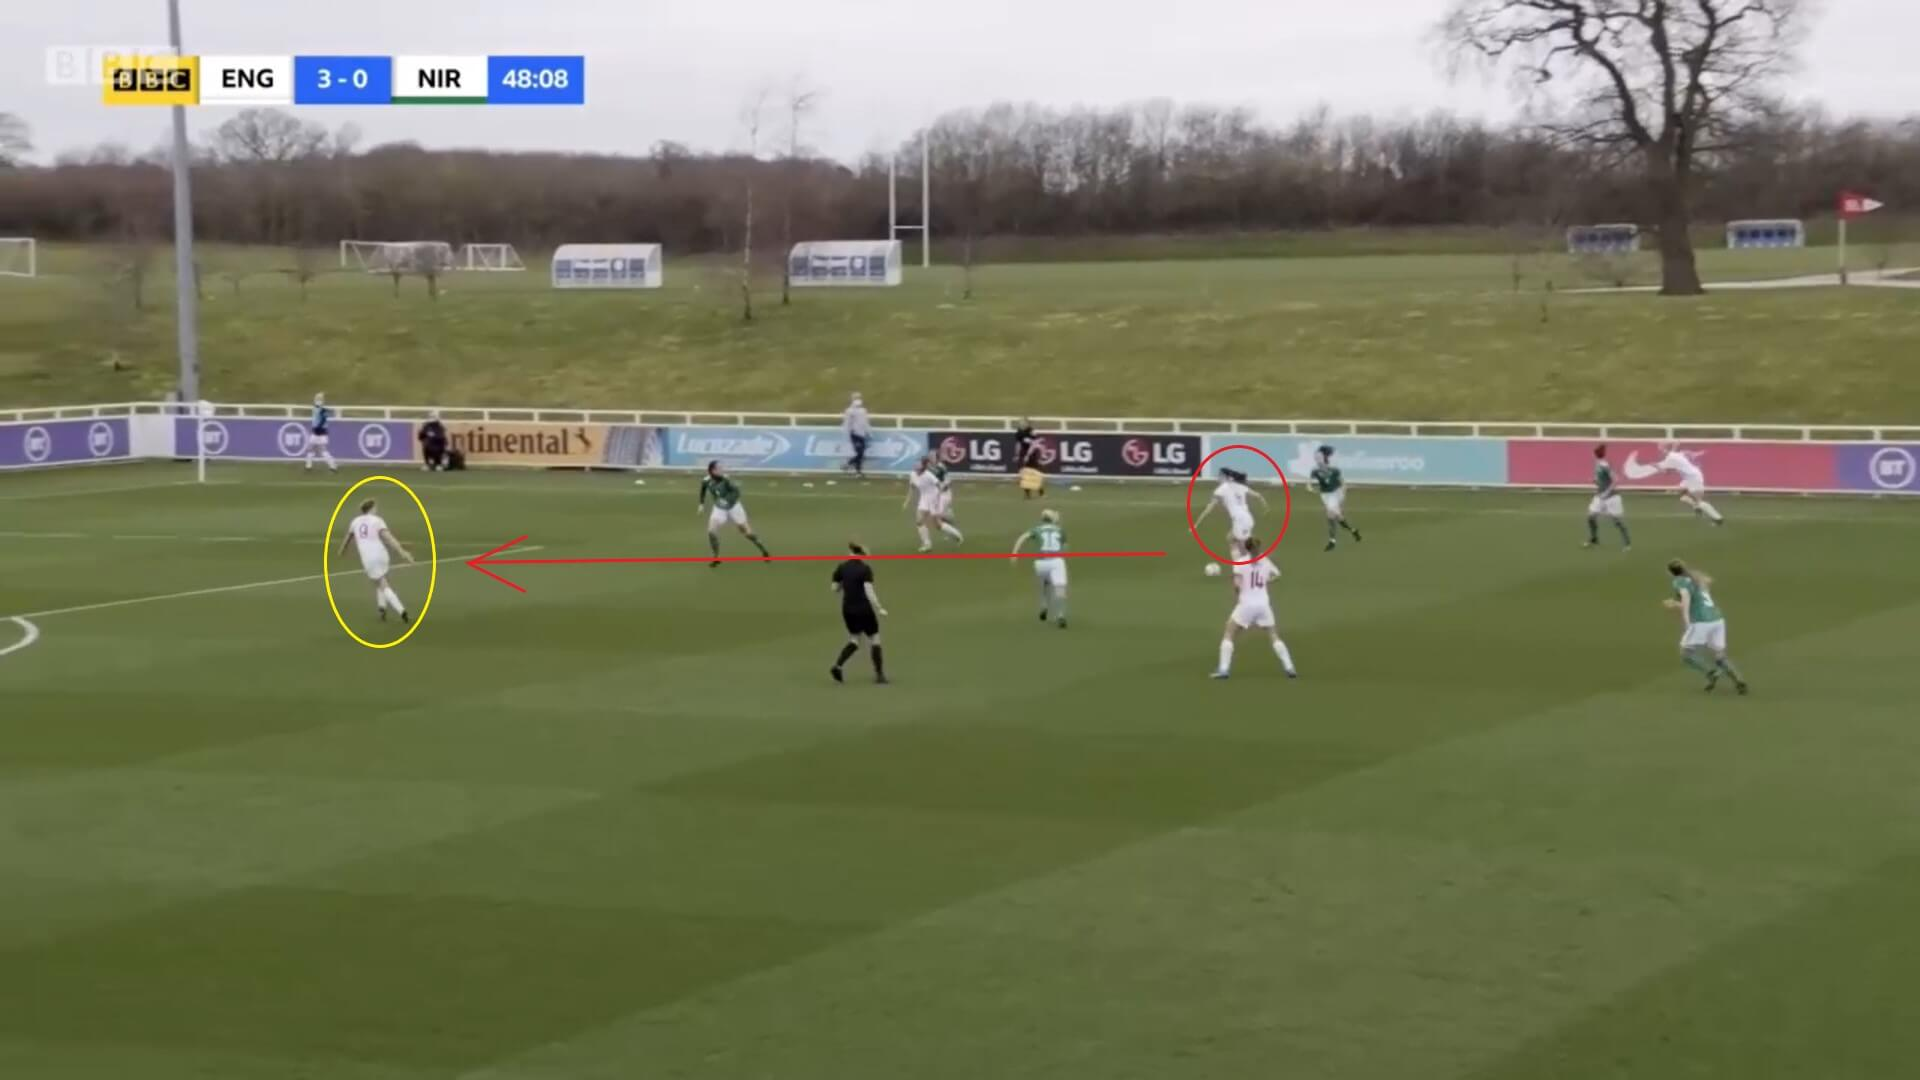 International Women's Friendly: England v Northern Ireland - tactical analysis tactics